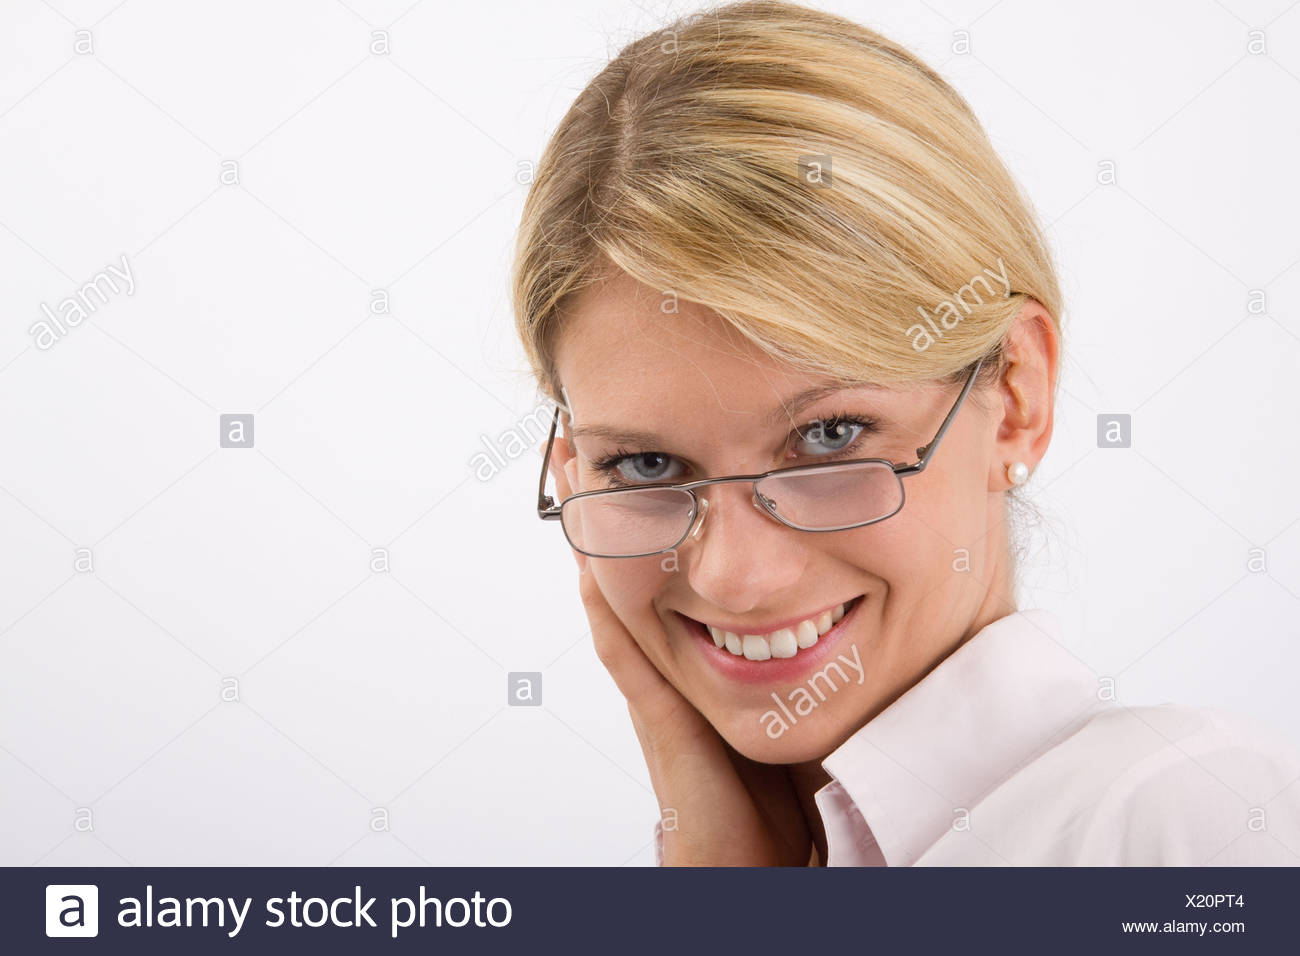 Eva laughing - Stock Image